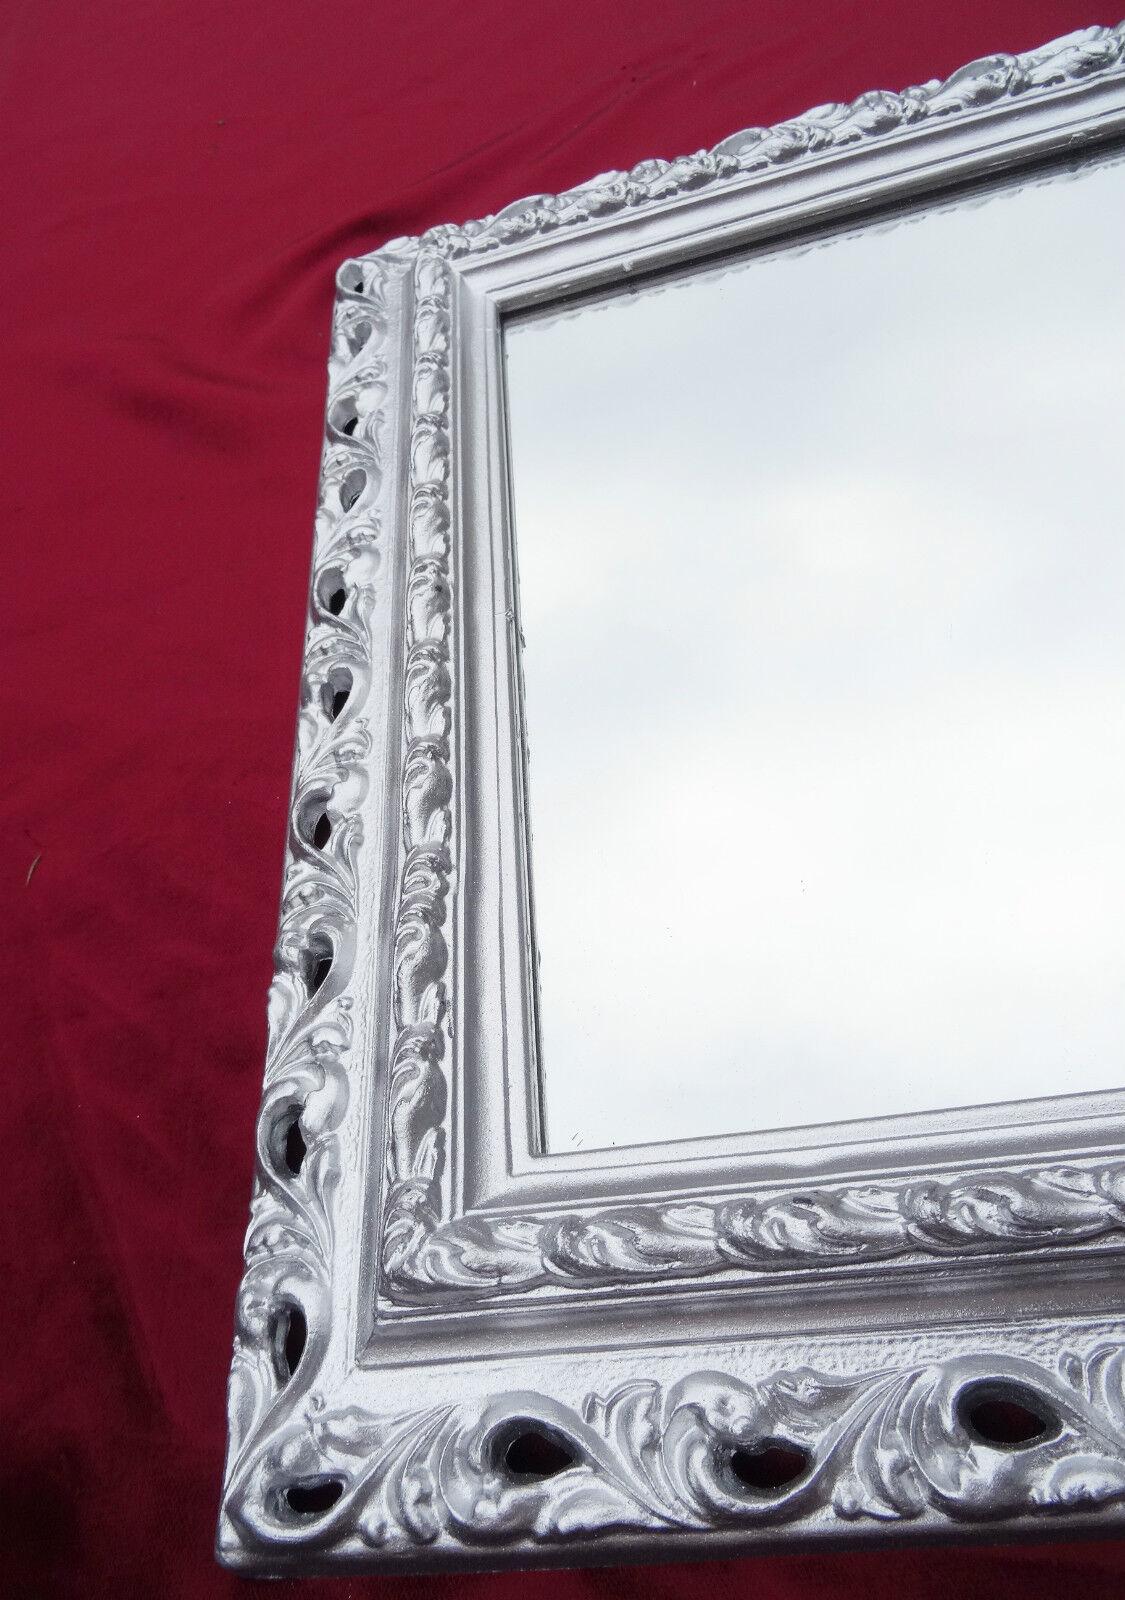 wandspiegel 43x36 spiegel barock rechteckig repro silber bilderrahmen arabesco 4 ebay. Black Bedroom Furniture Sets. Home Design Ideas